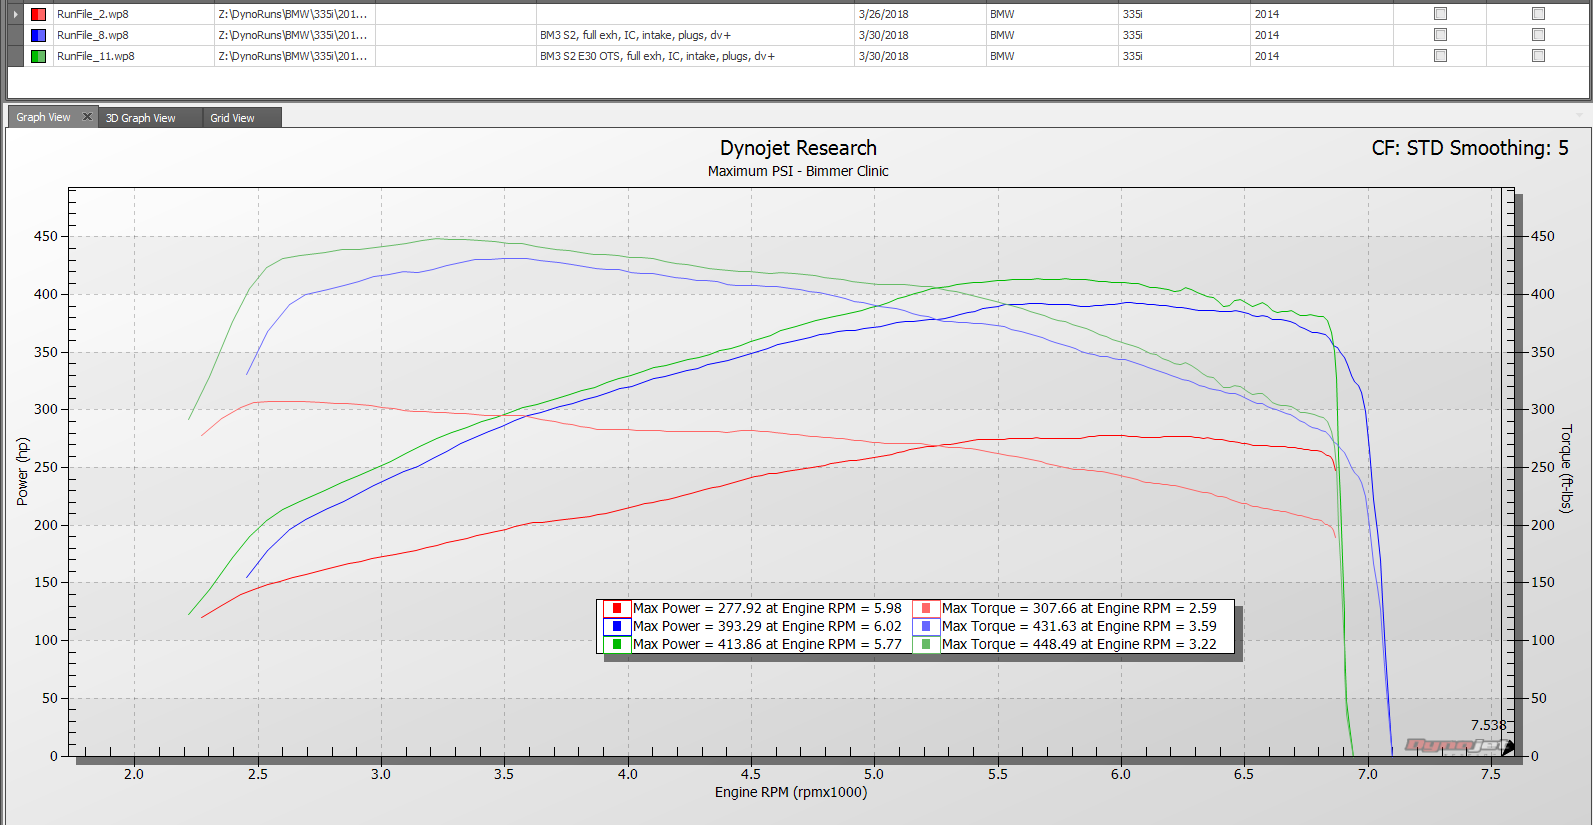 MaxPSI - FBO F30 335i dyno results w/BM3 stage 2 93 and E30